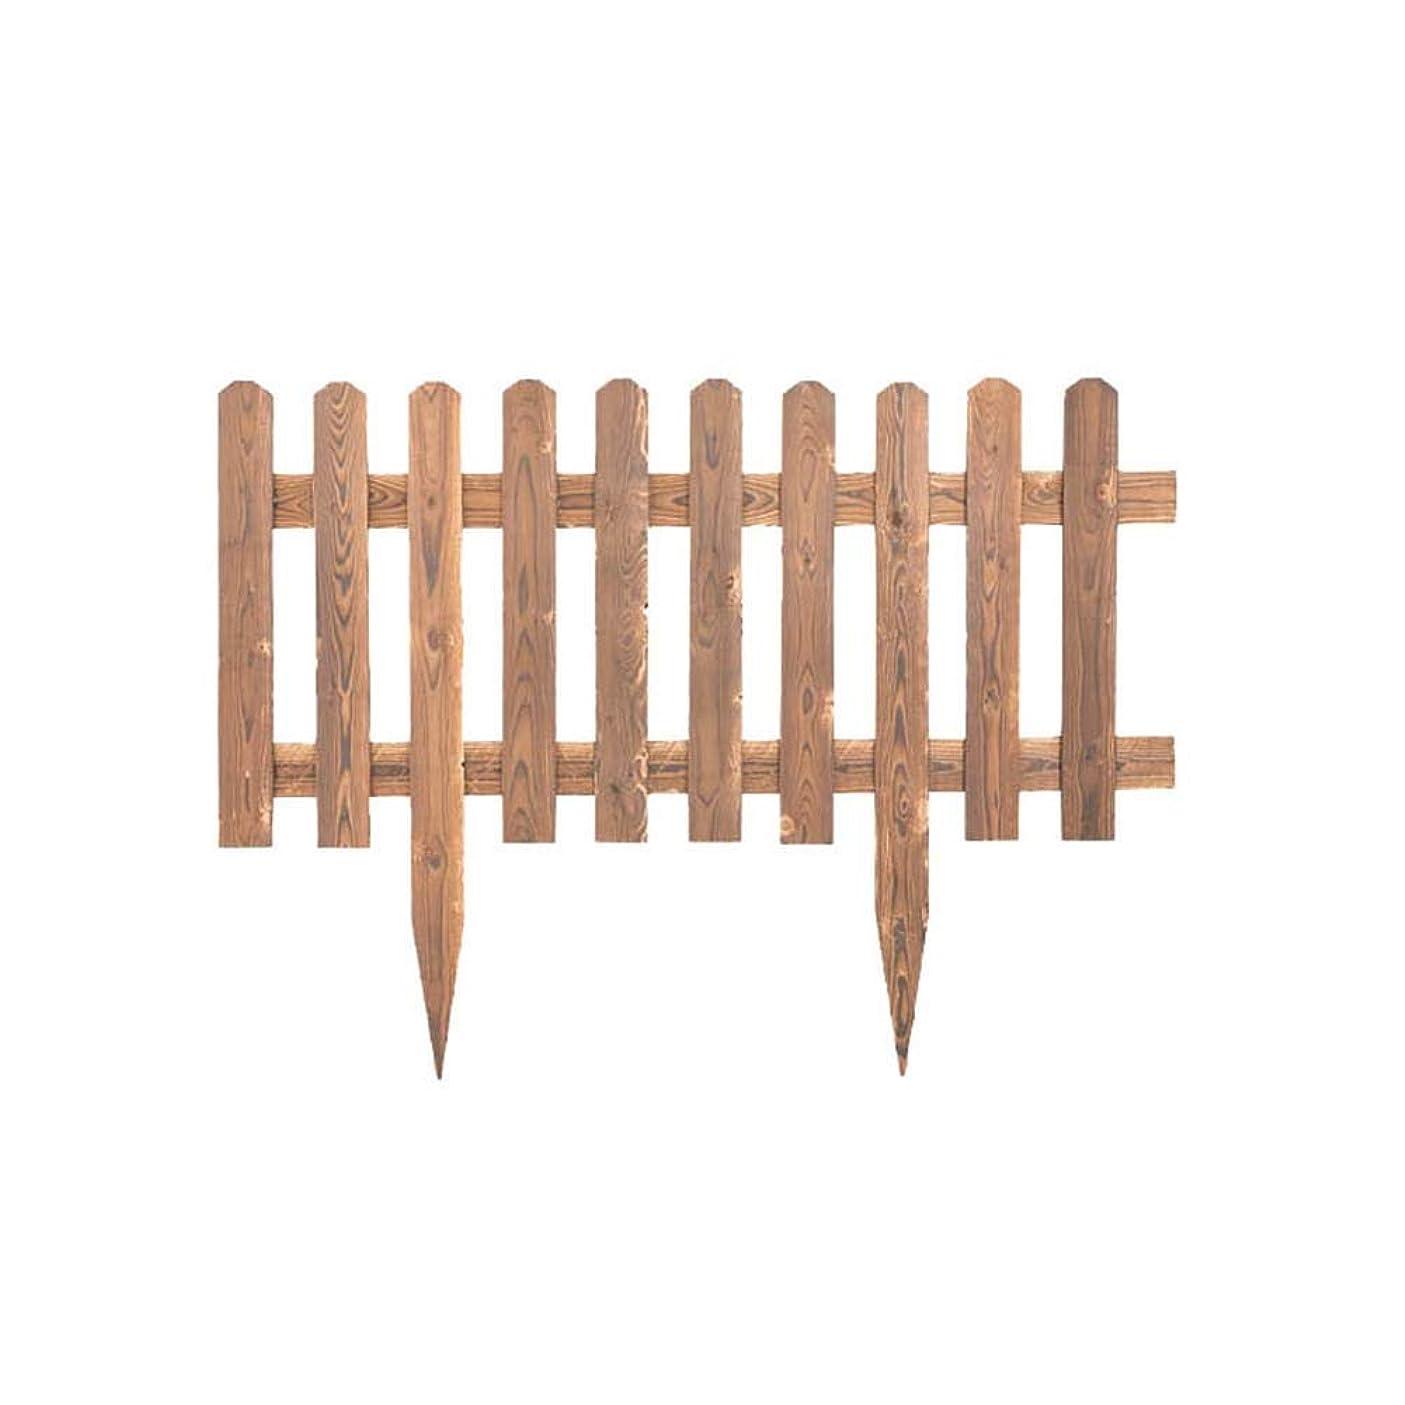 YYFANG 木製フェンス先のとがった杭の設計防水塀の防蝕プロセス花壇の装飾の高温炭化、4サイズ (Color : Brown, Size : 120x90cm)